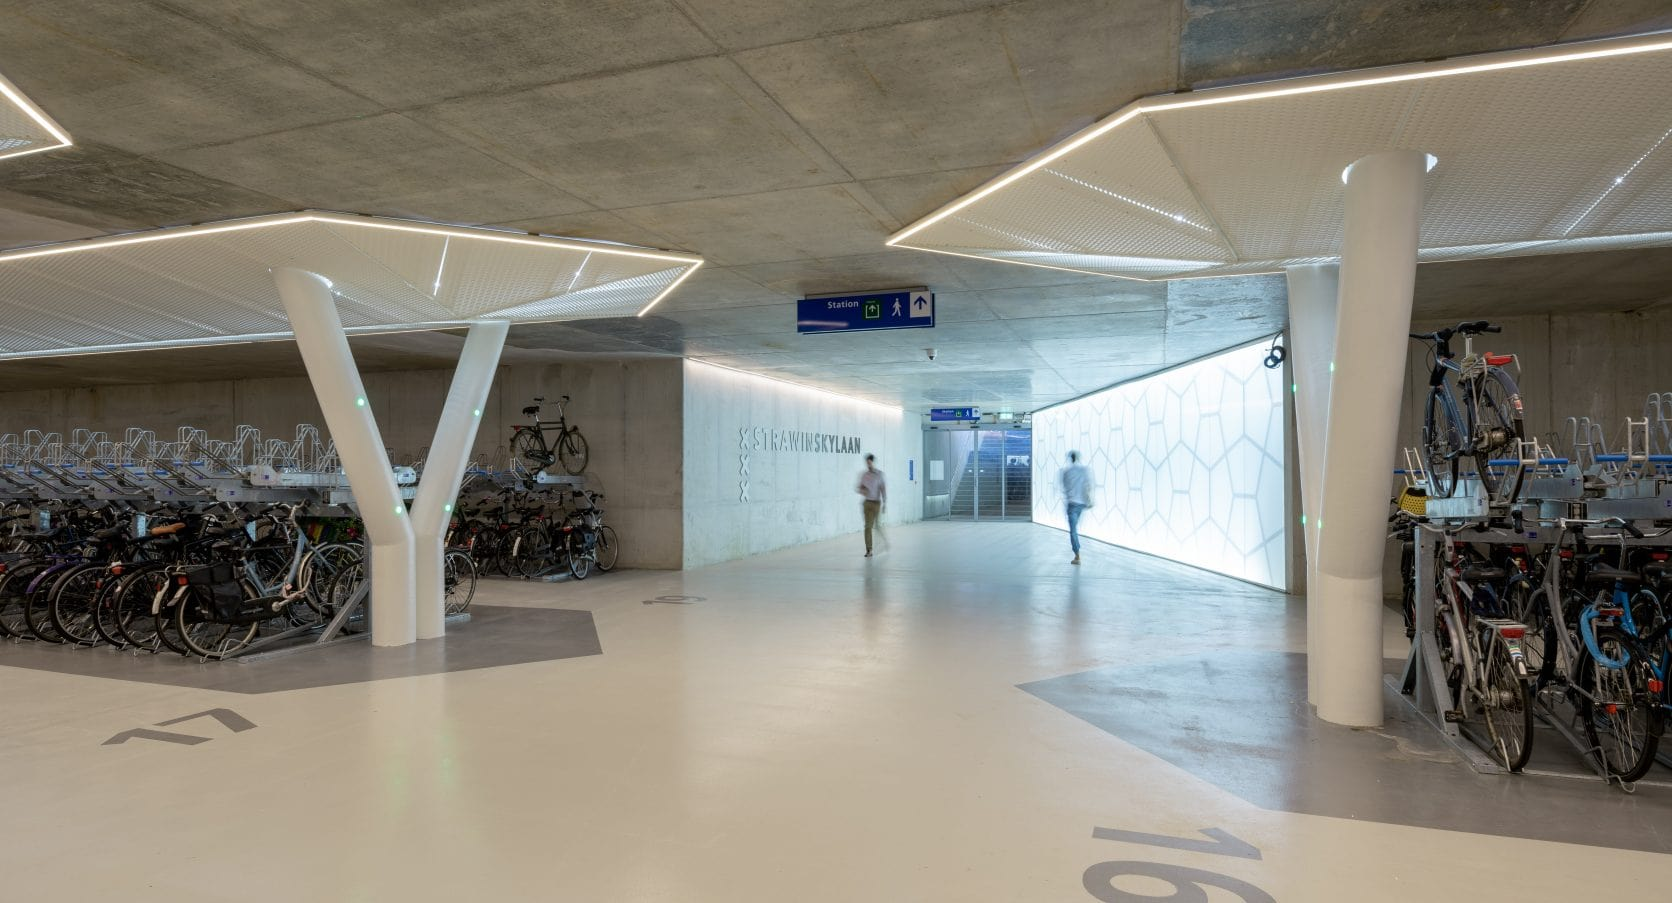 Vijfhoek fietsparkeergarage Amsterdam MD Strekmetaal plafond